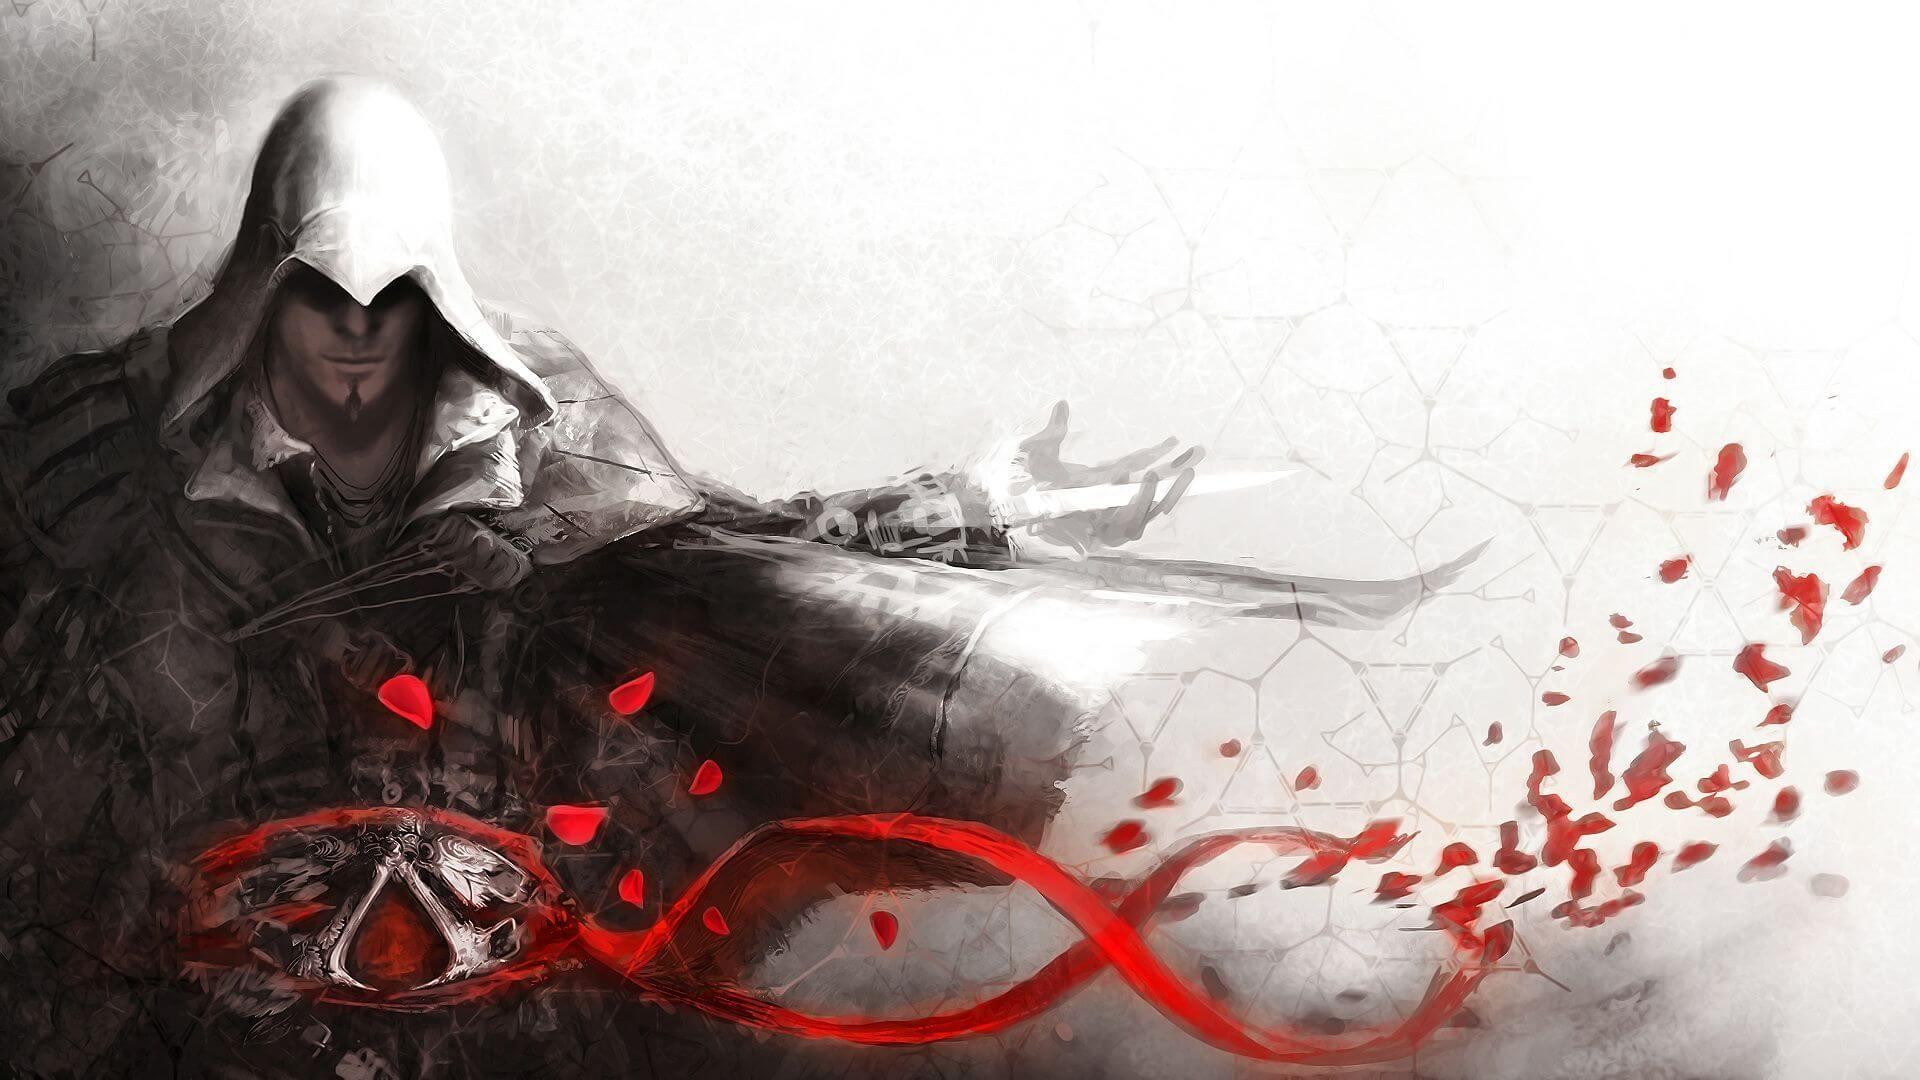 Обои и картинки Assassins creed на рабочий стол - подборка 12